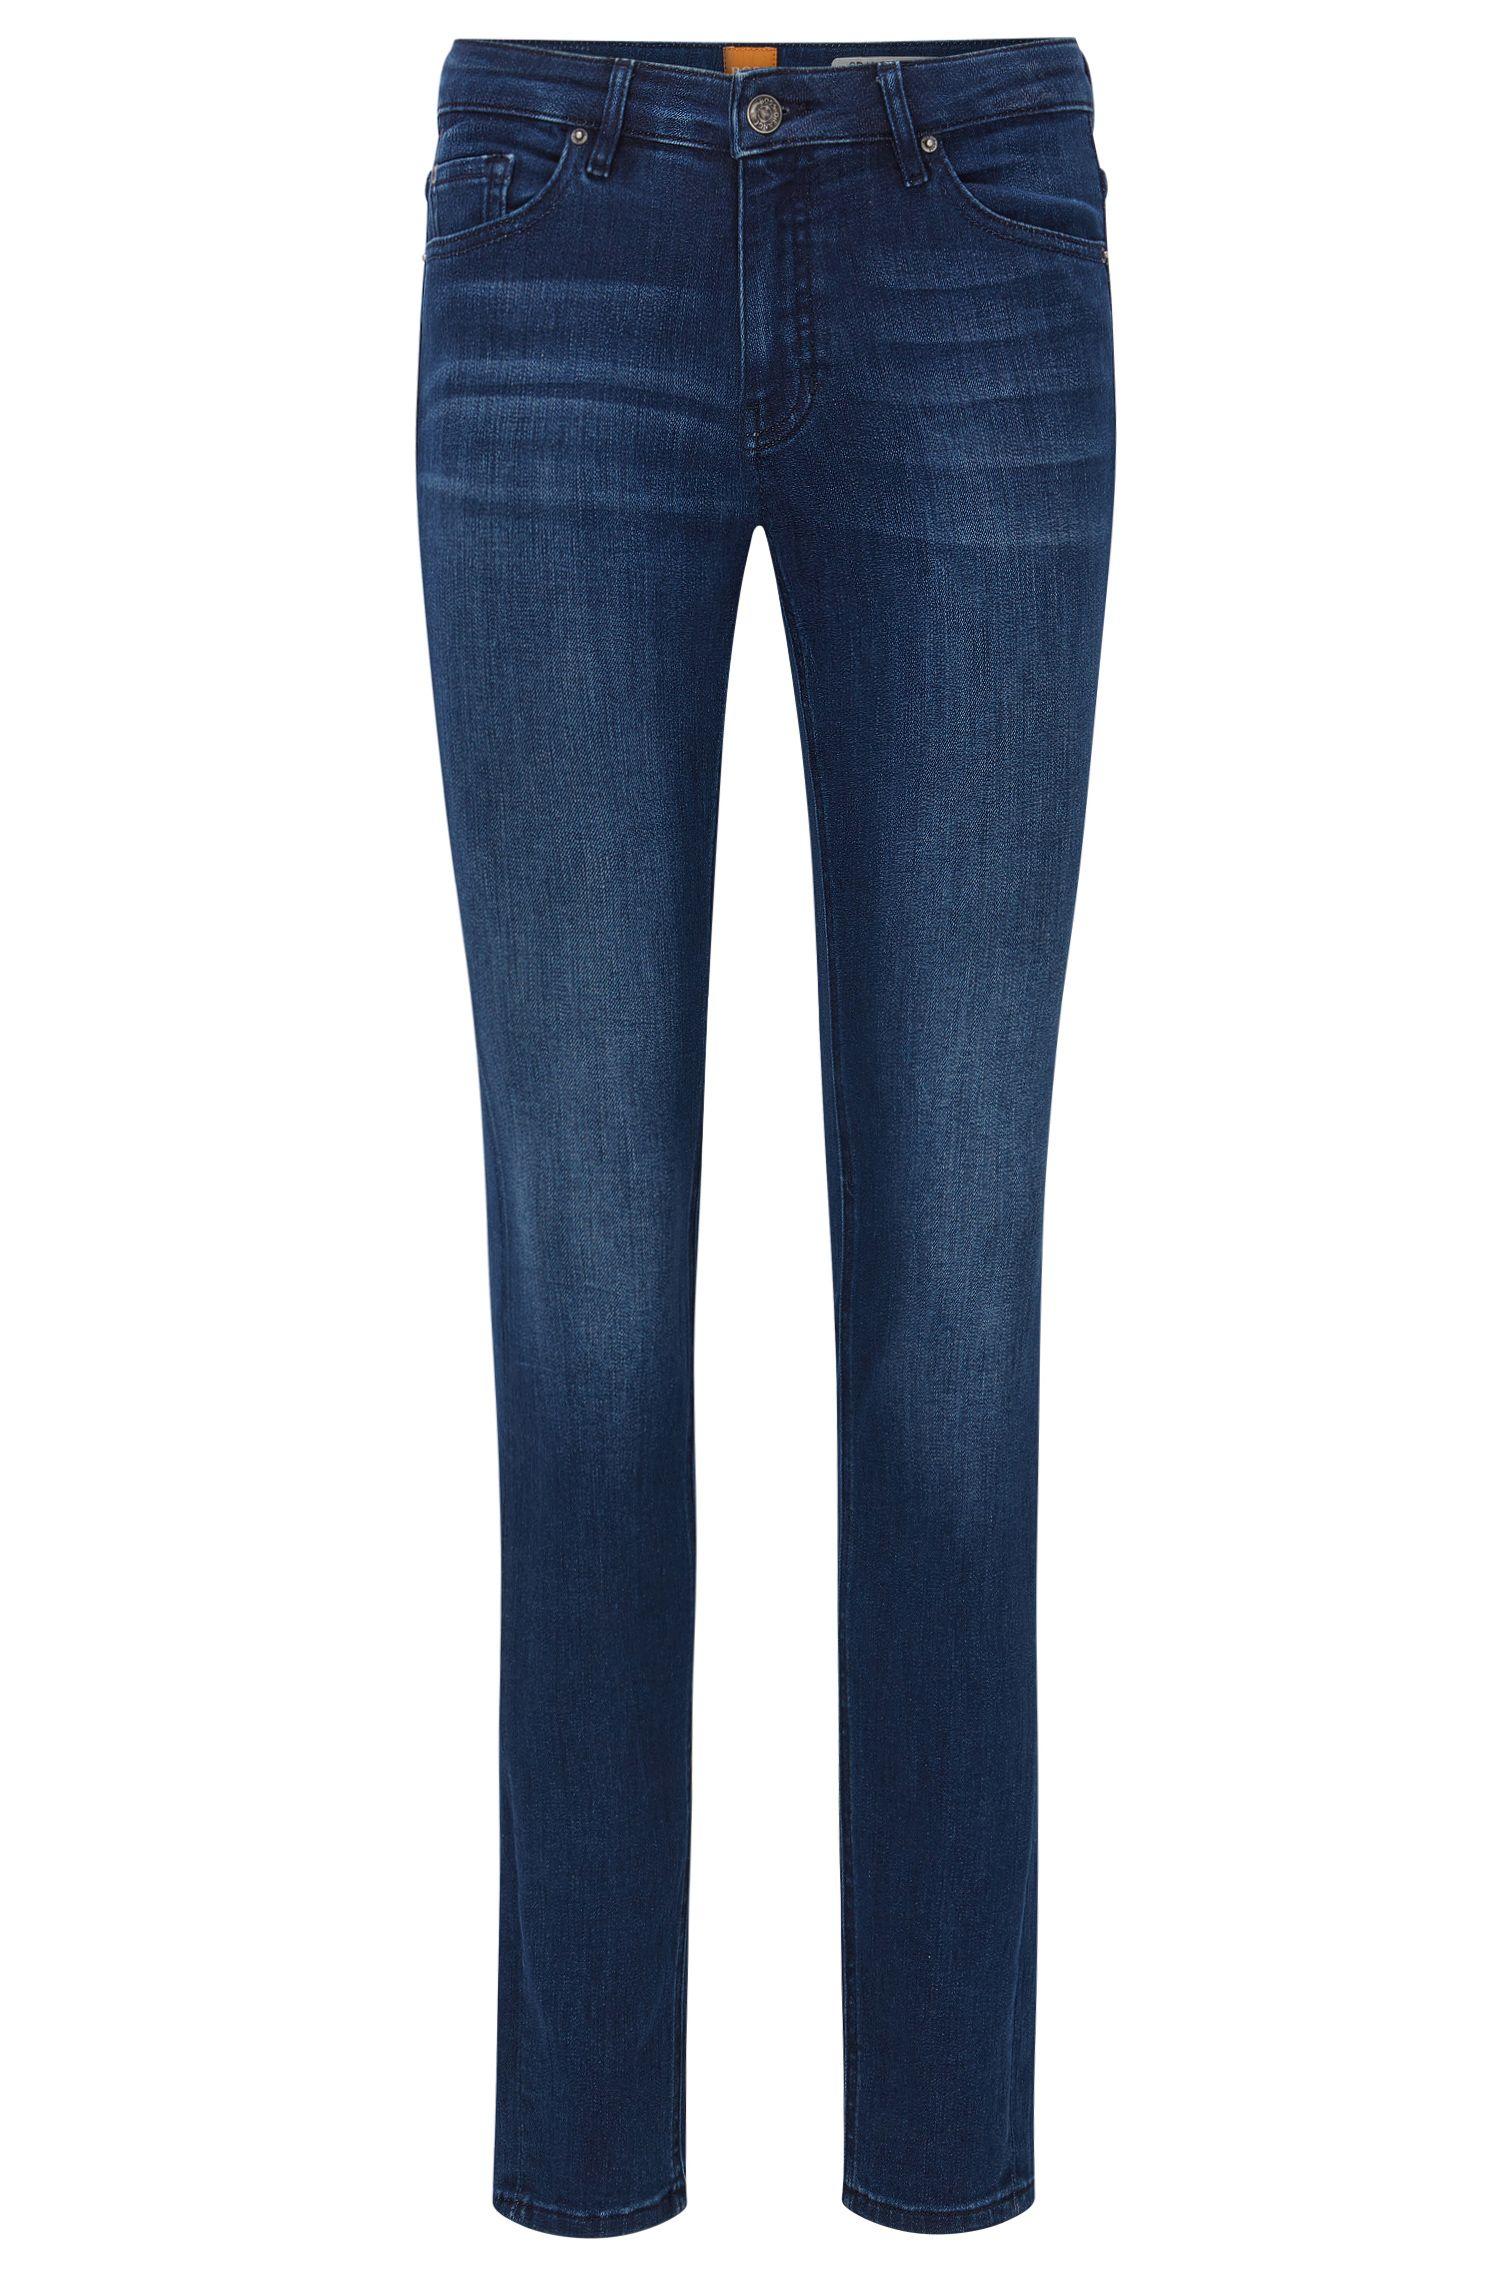 Jeans slim fit in comodo denim elasticizzato